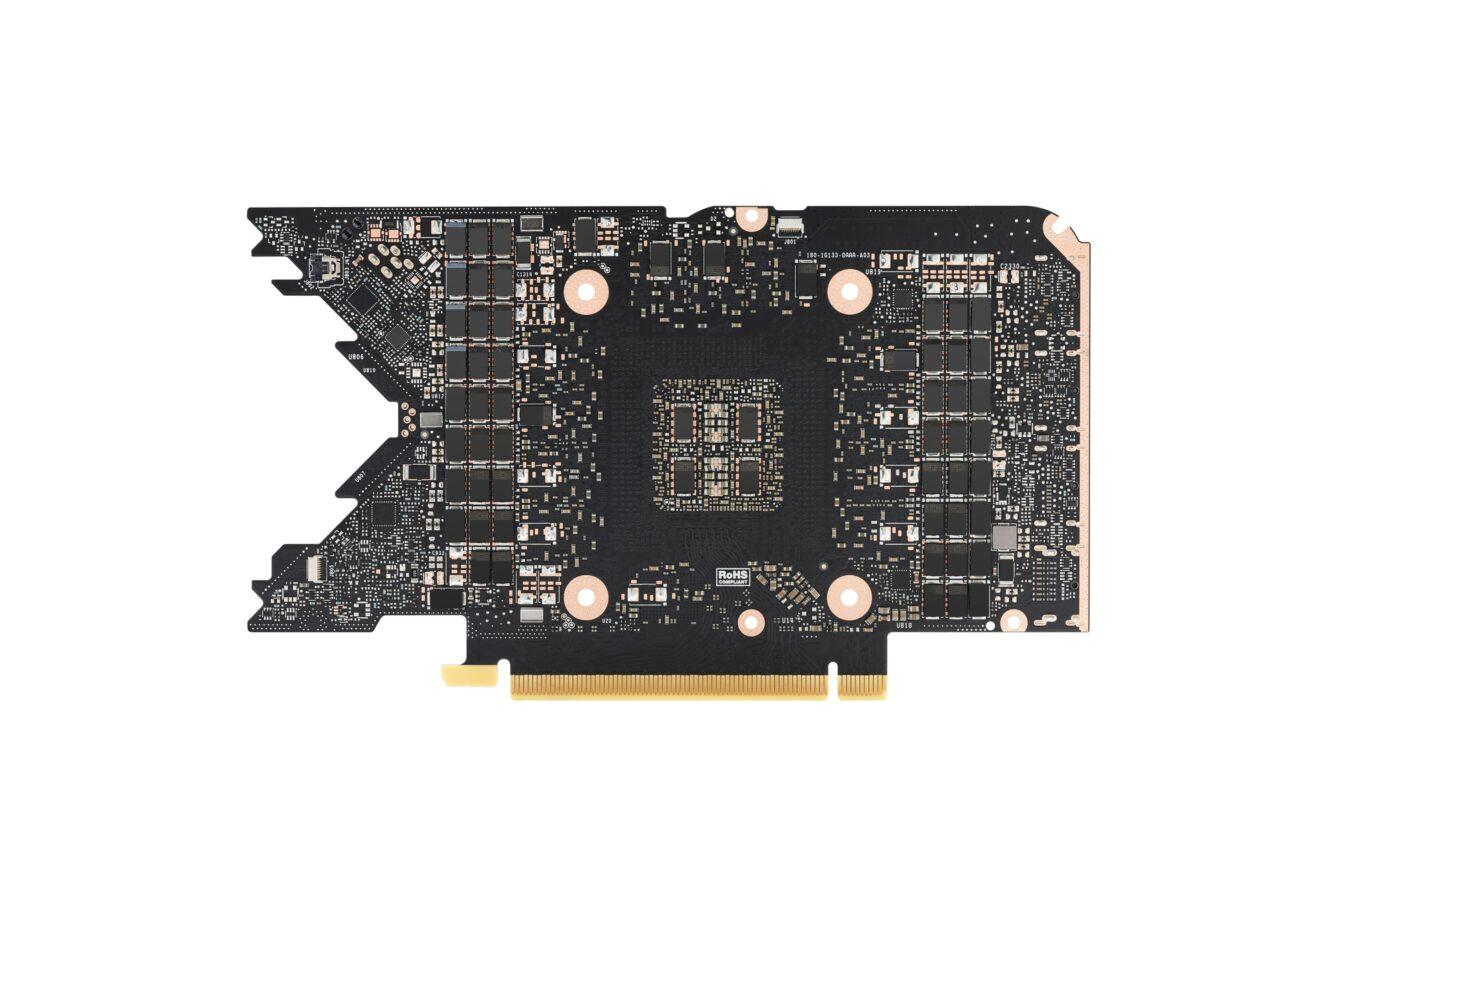 ampere-3080ti_pcb-back-5070460b180891cc956-19636802-custom